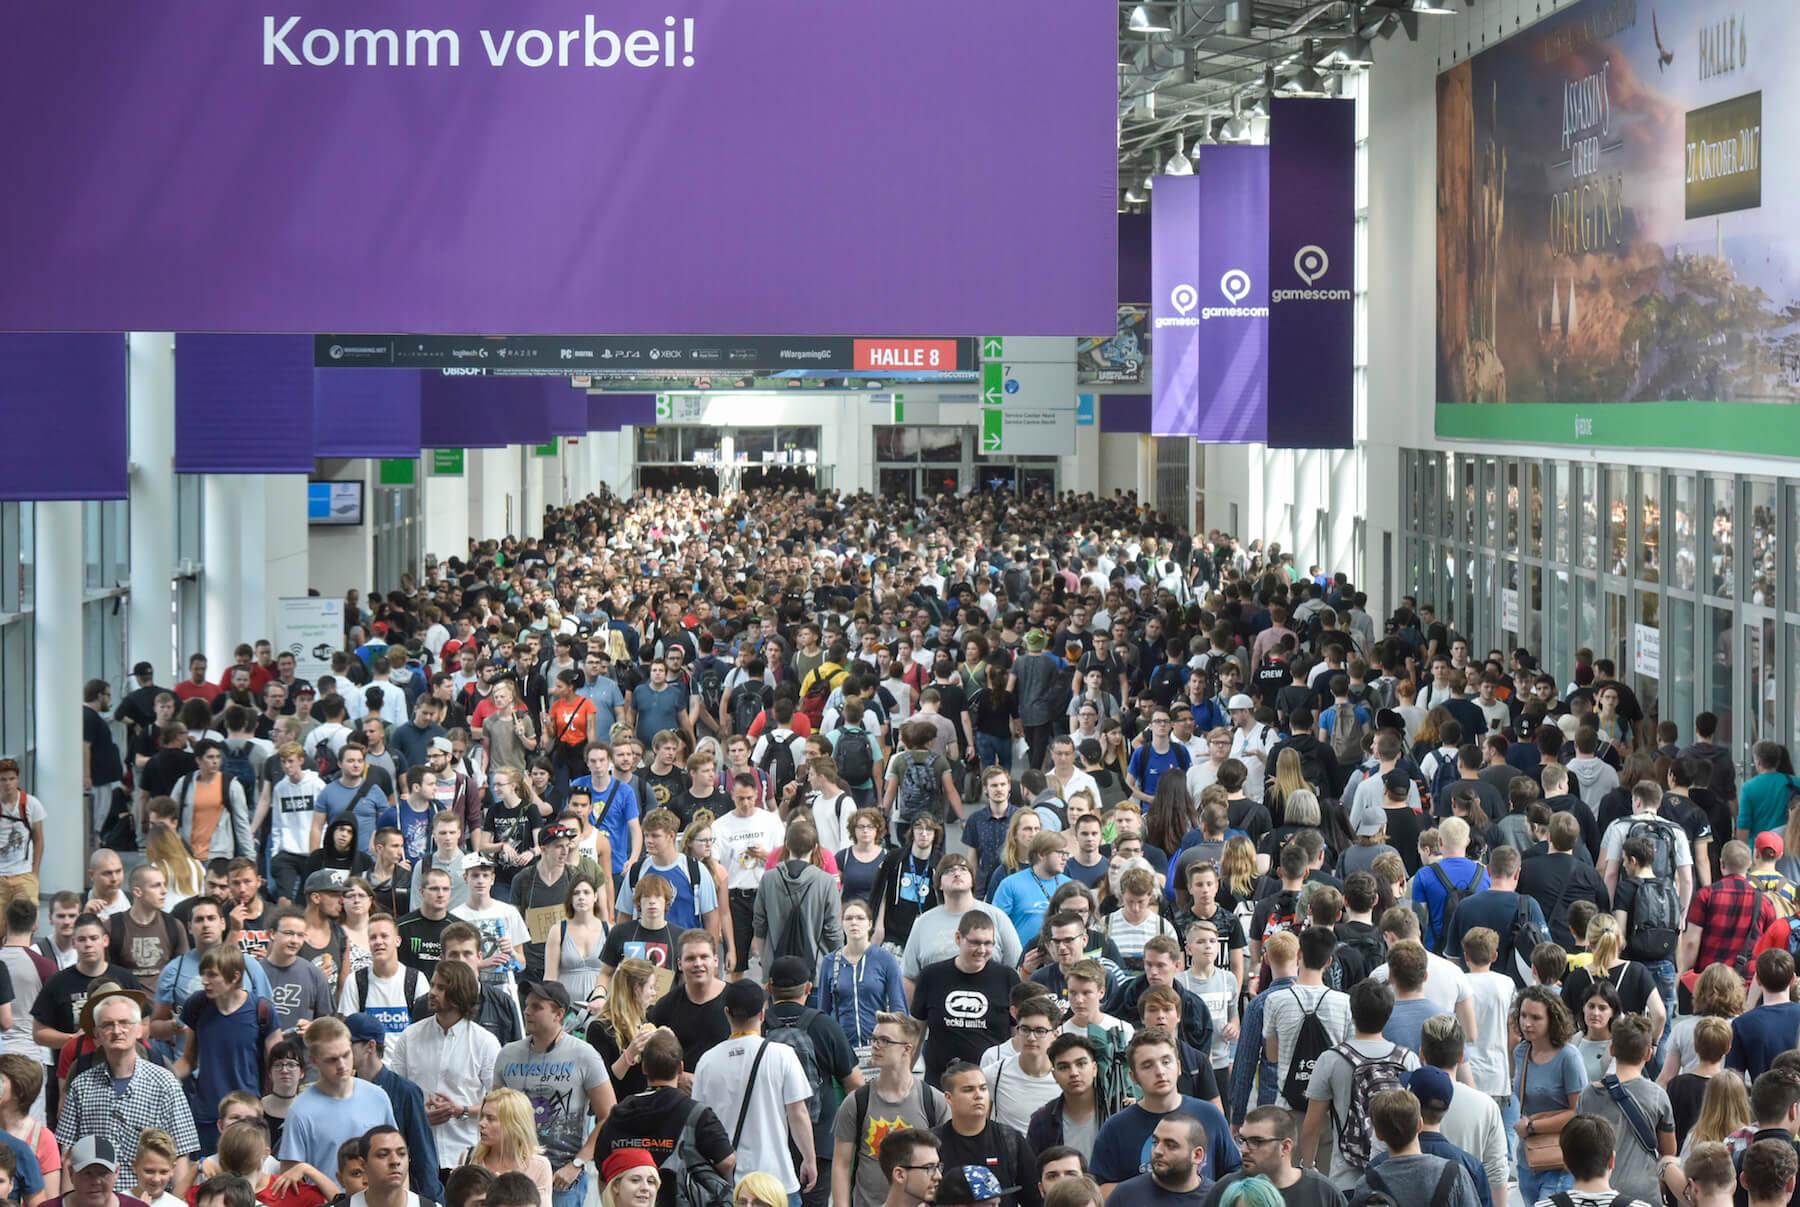 Gamescom 2017: Boulevard Nord (Bildrechte: Koelnmesse GmbH, Thomas Klerx)